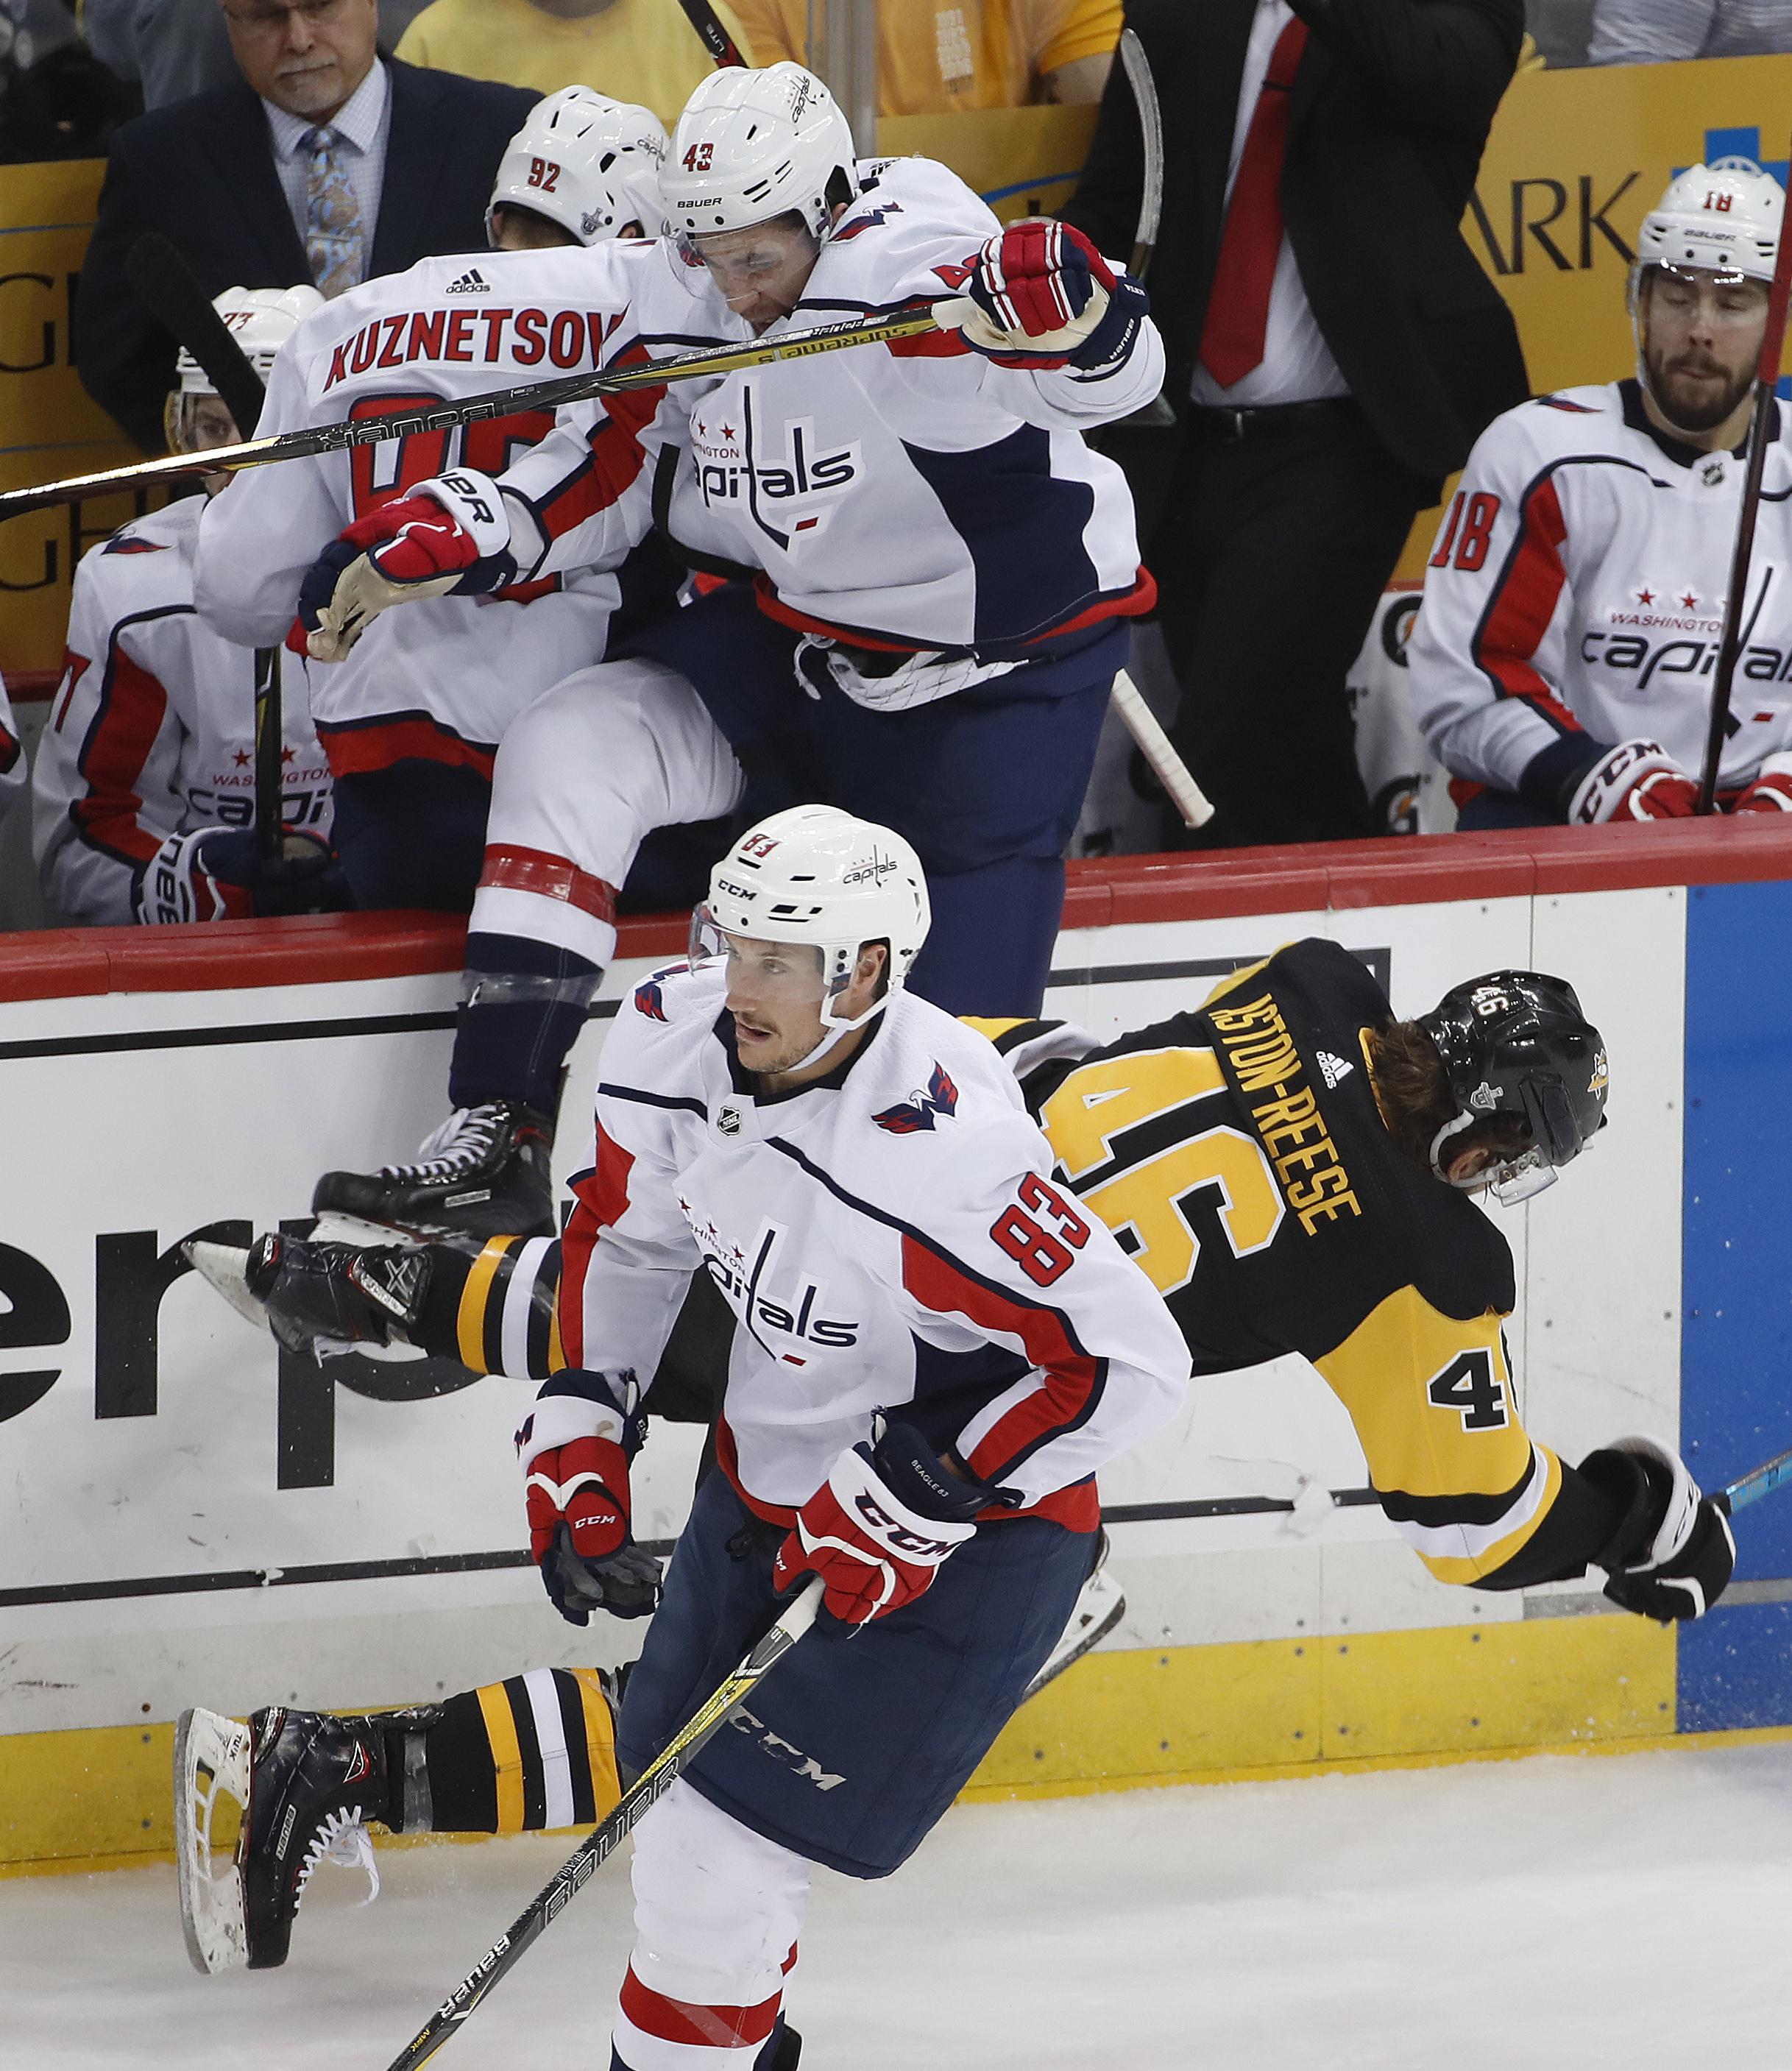 c9e9063e22e Washington Capitals  Tom Wilson (43) collides with Pittsburgh Penguins   Zach Aston-